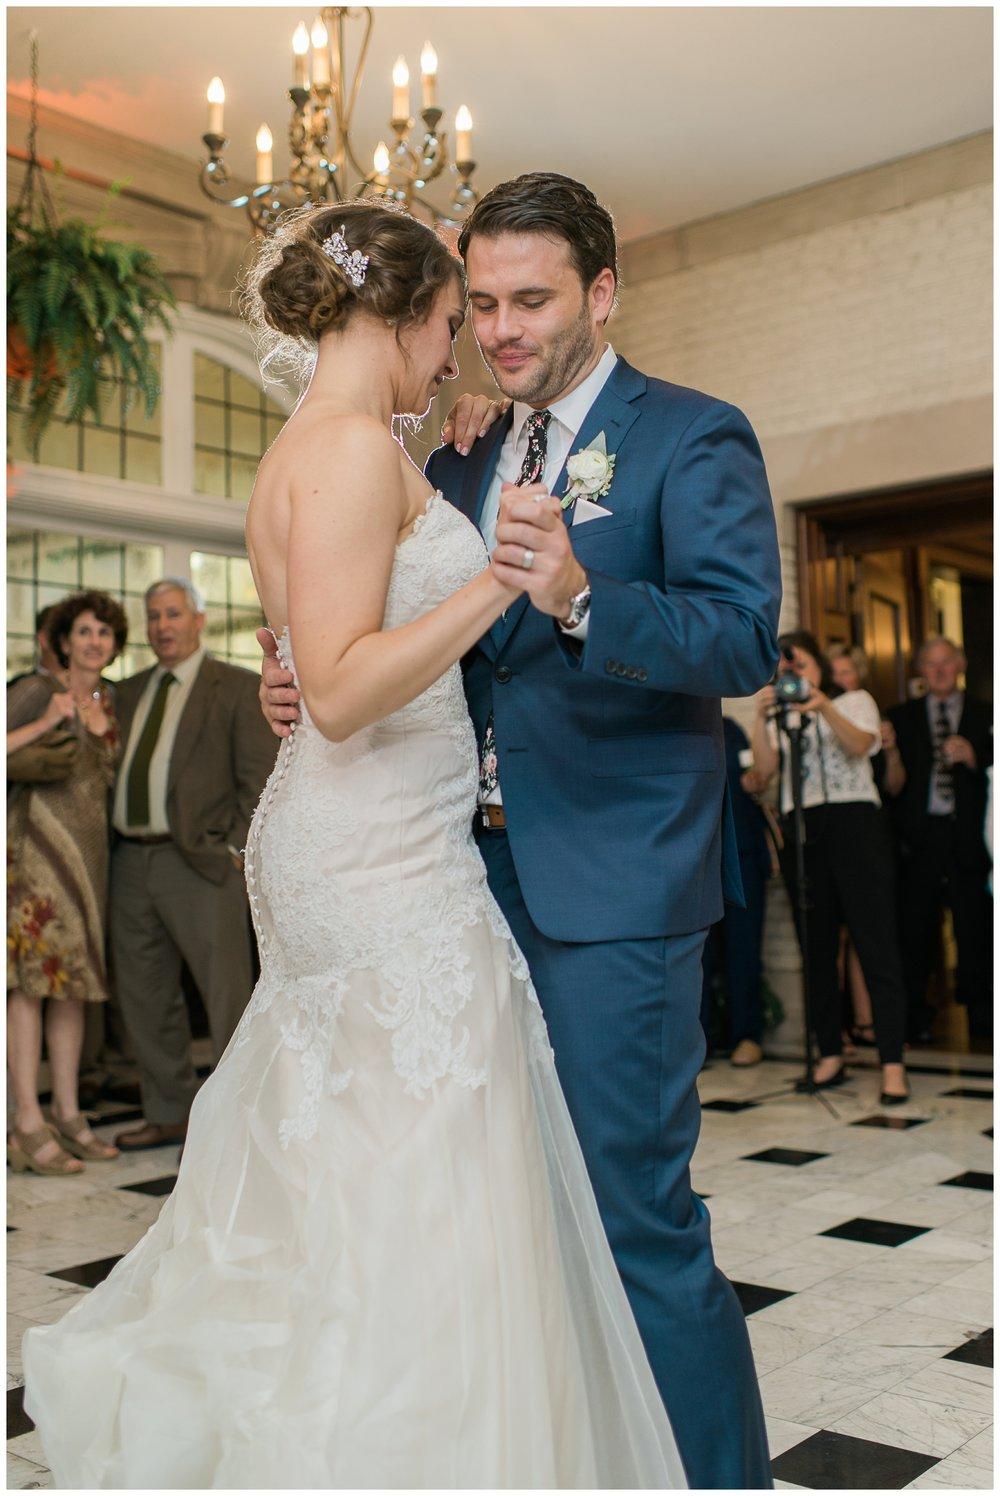 Rebecca_Bridges_Photography_Indianapolis_Wedding_Photographer_5254.jpg